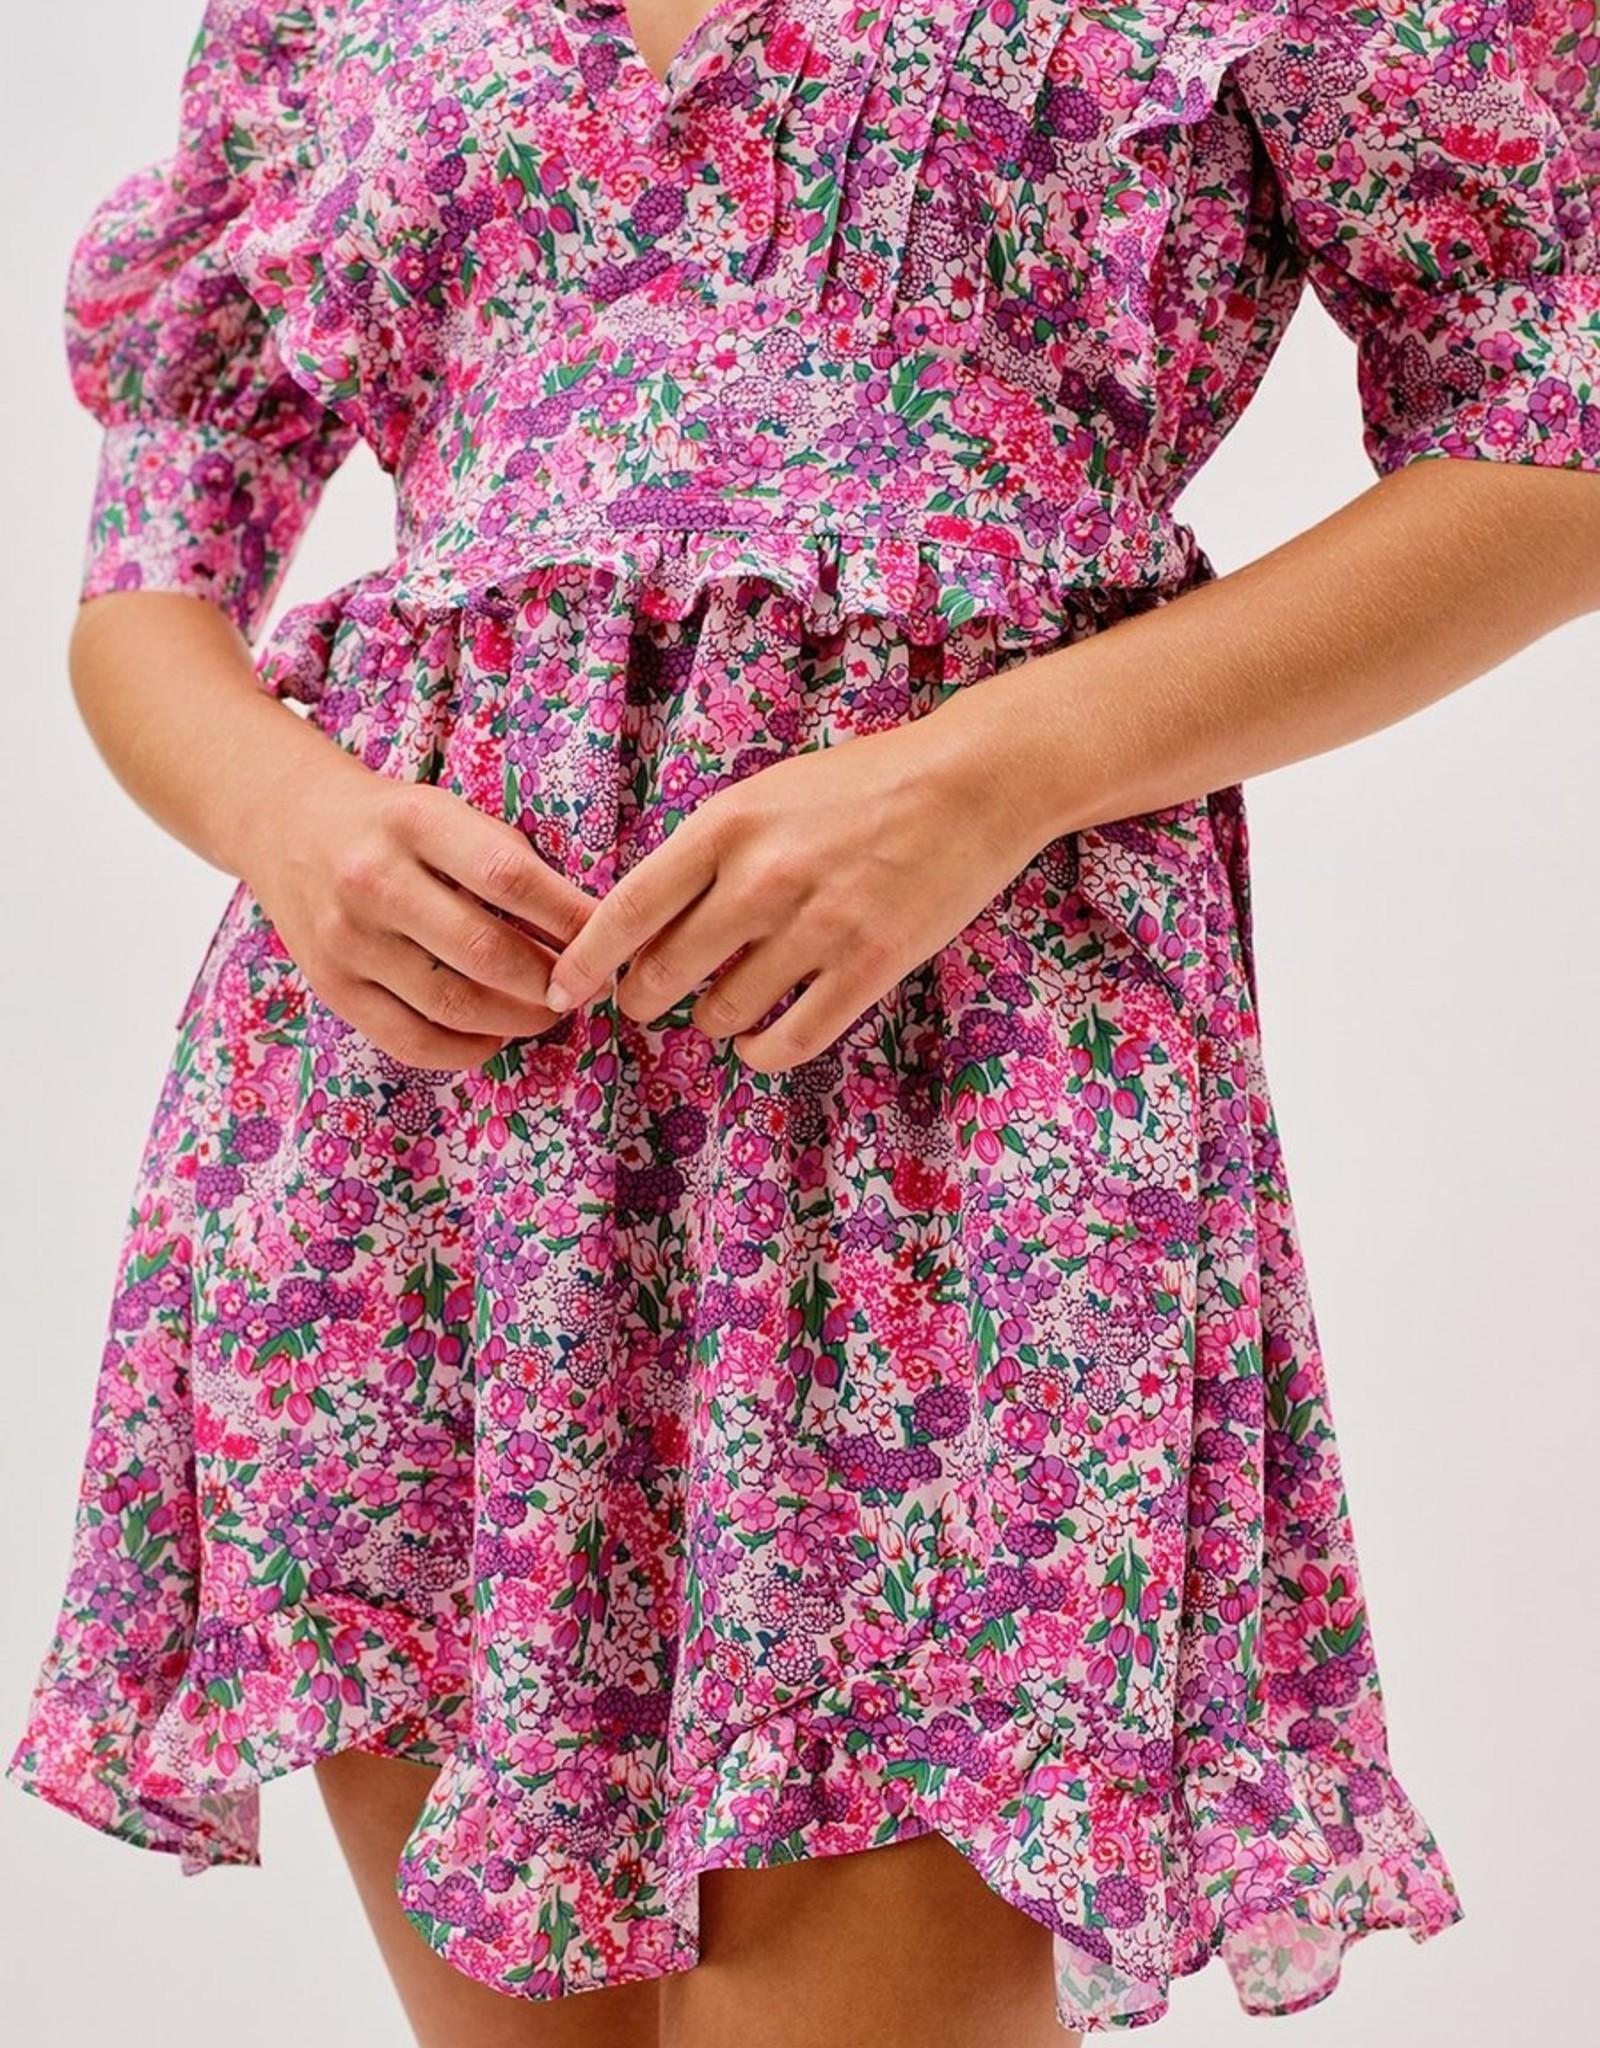 For Love and Lemon CD2383 Katarina Mini Dress